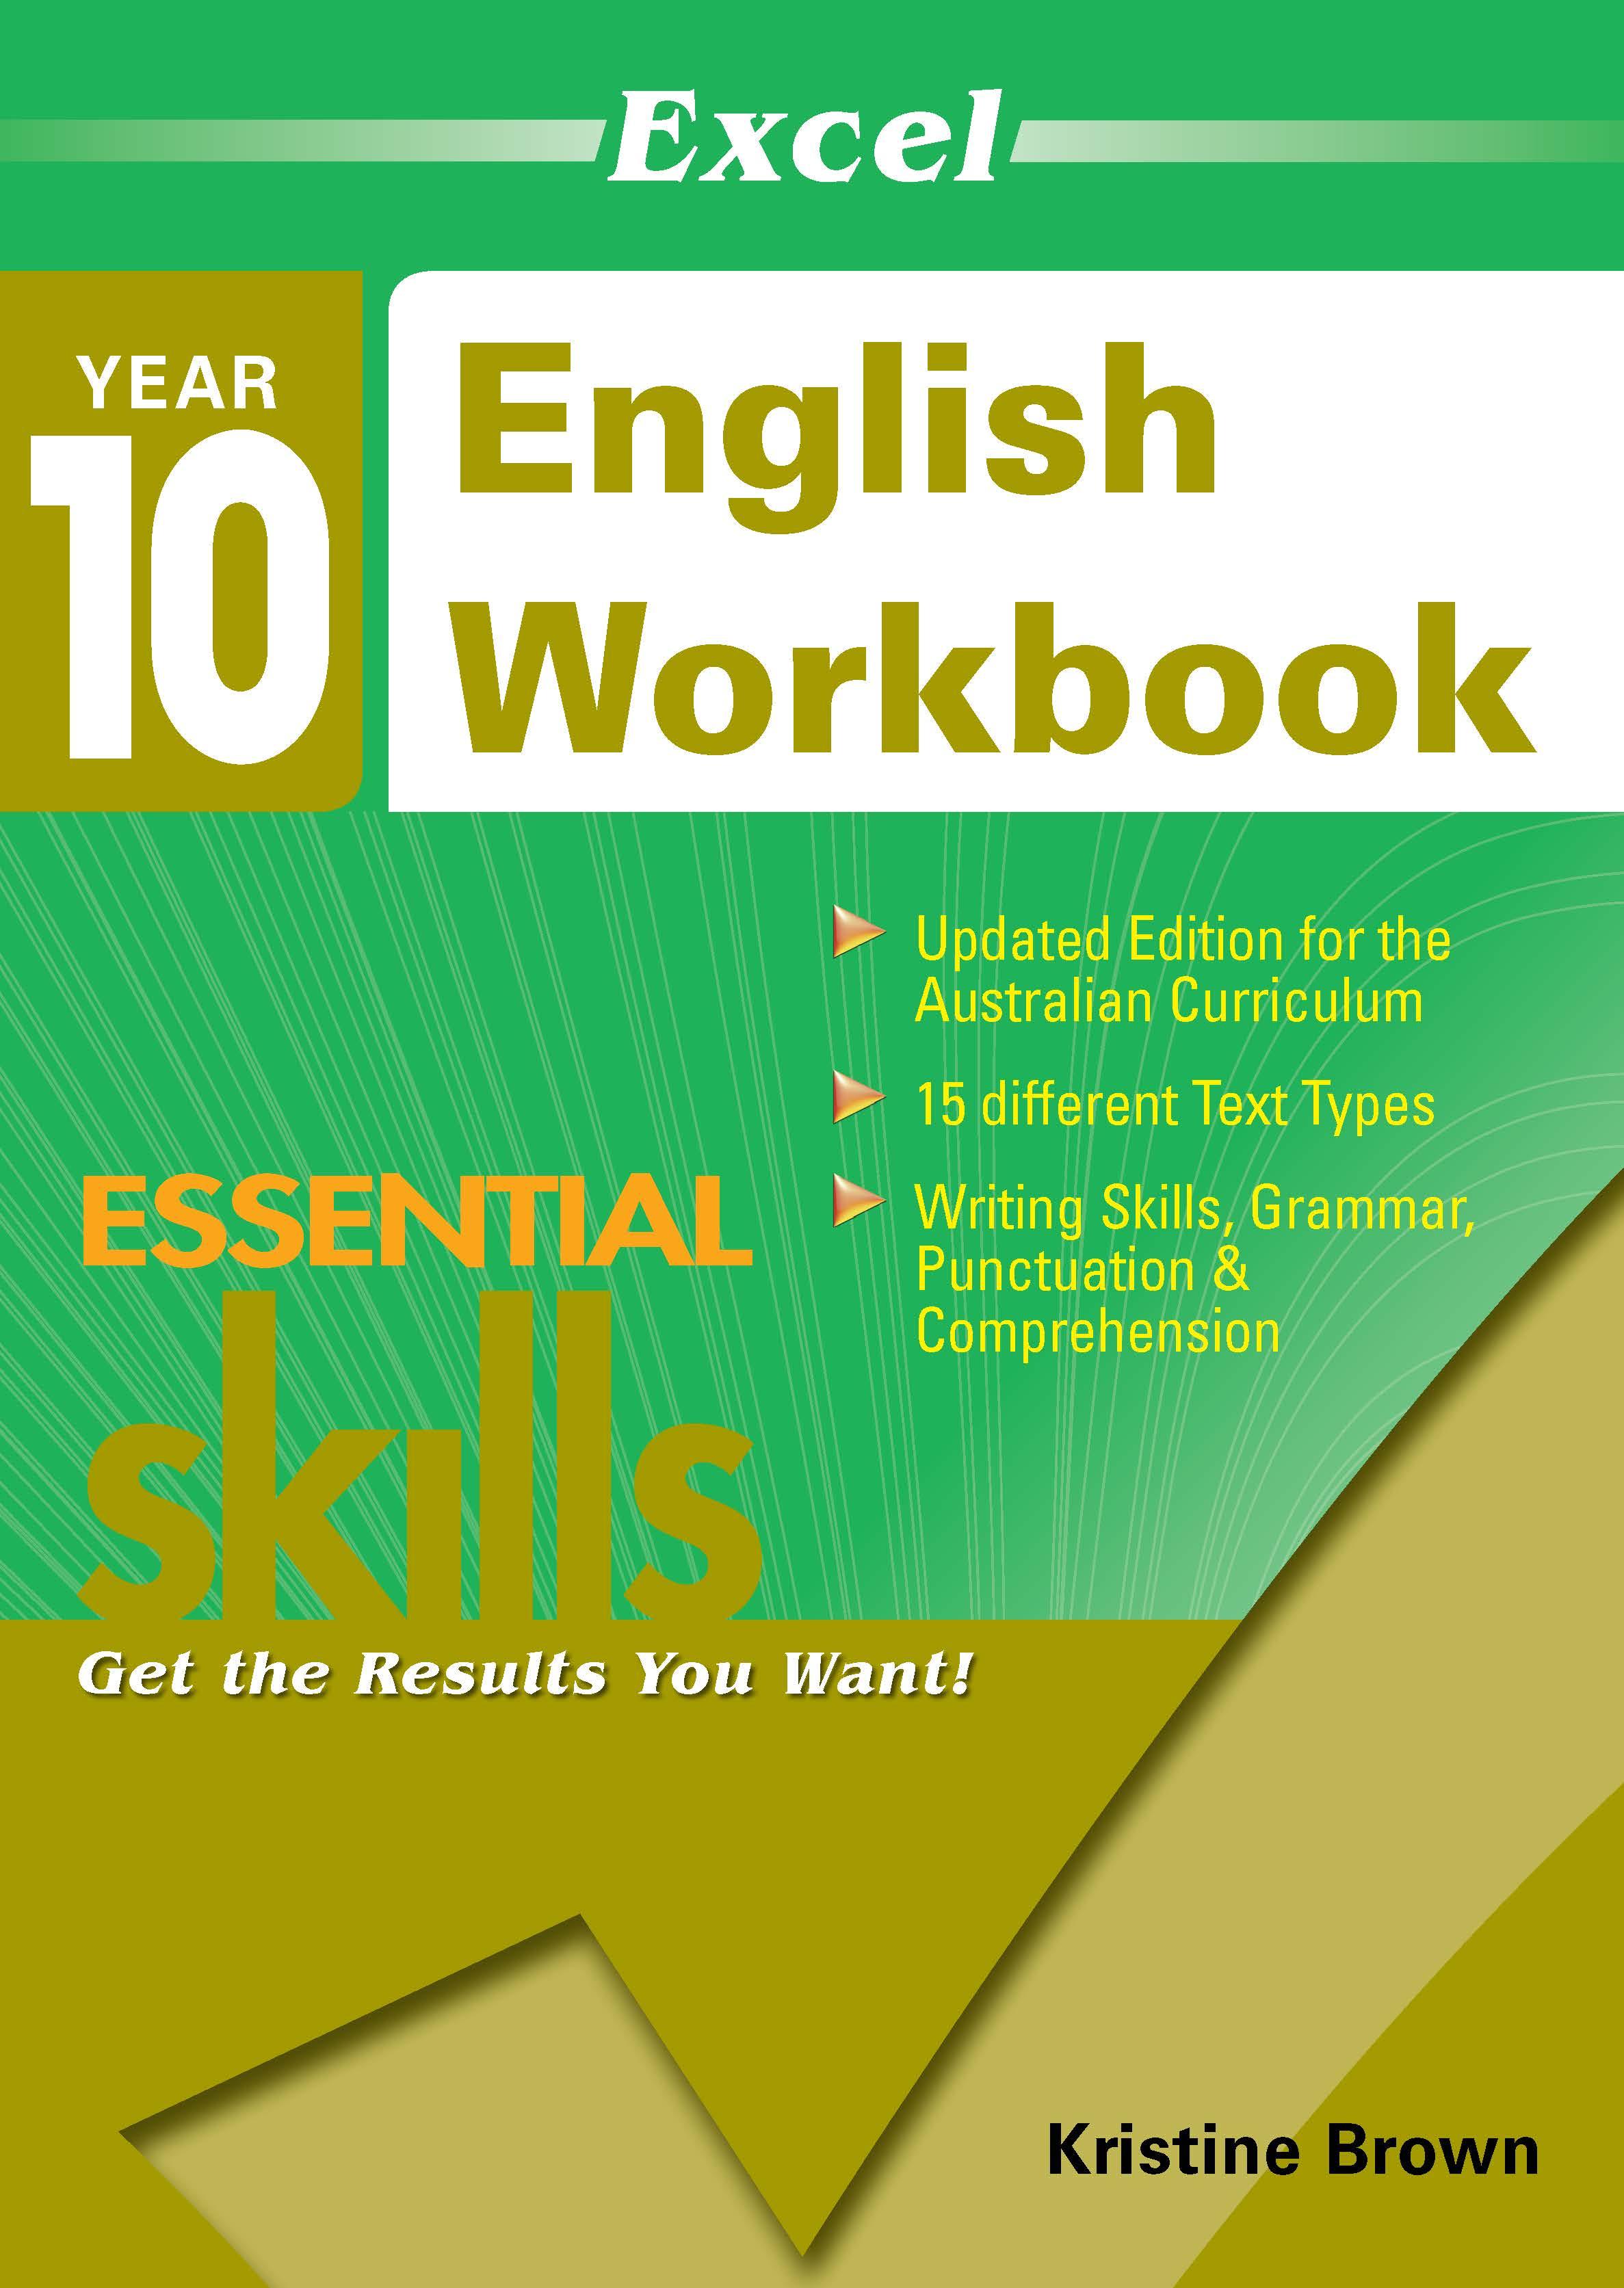 Excel Essential Skills: English Workbook Year 10